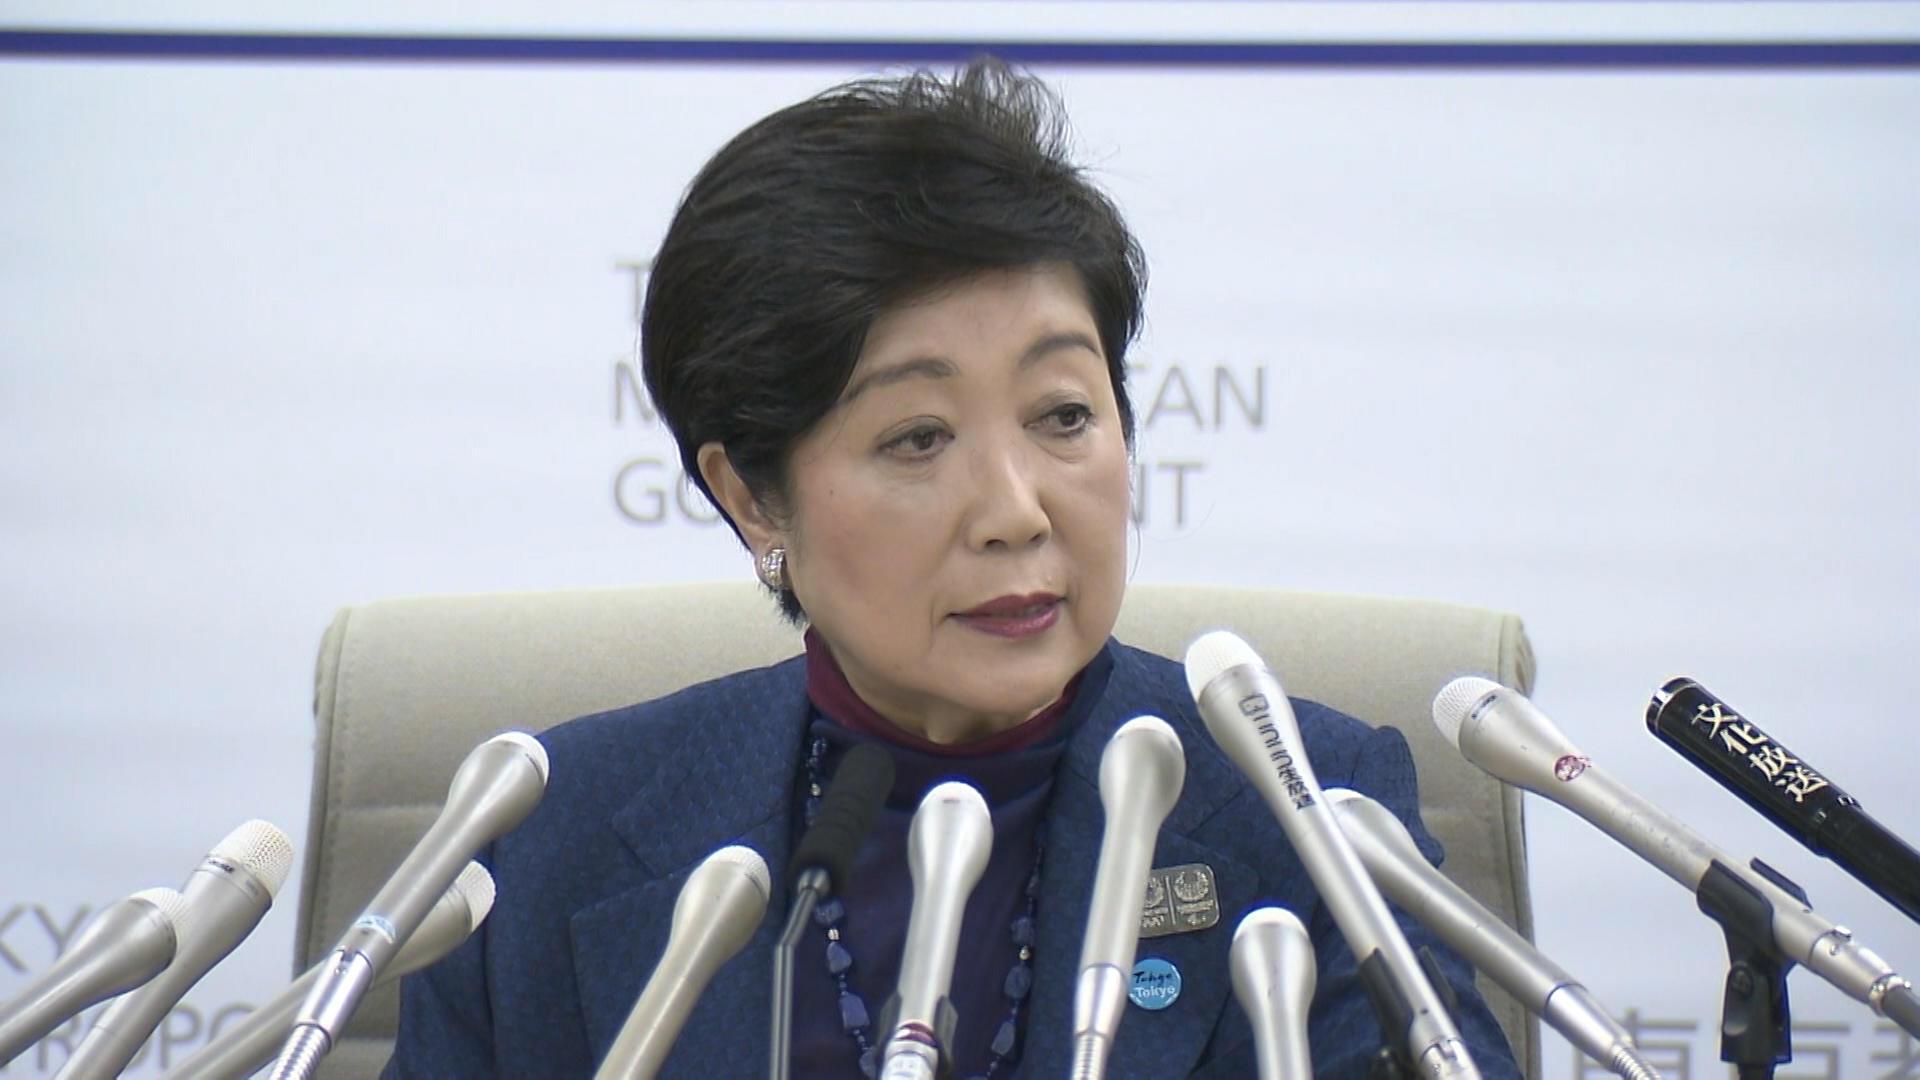 CORONAVIRUS: Japan has 96 new cases